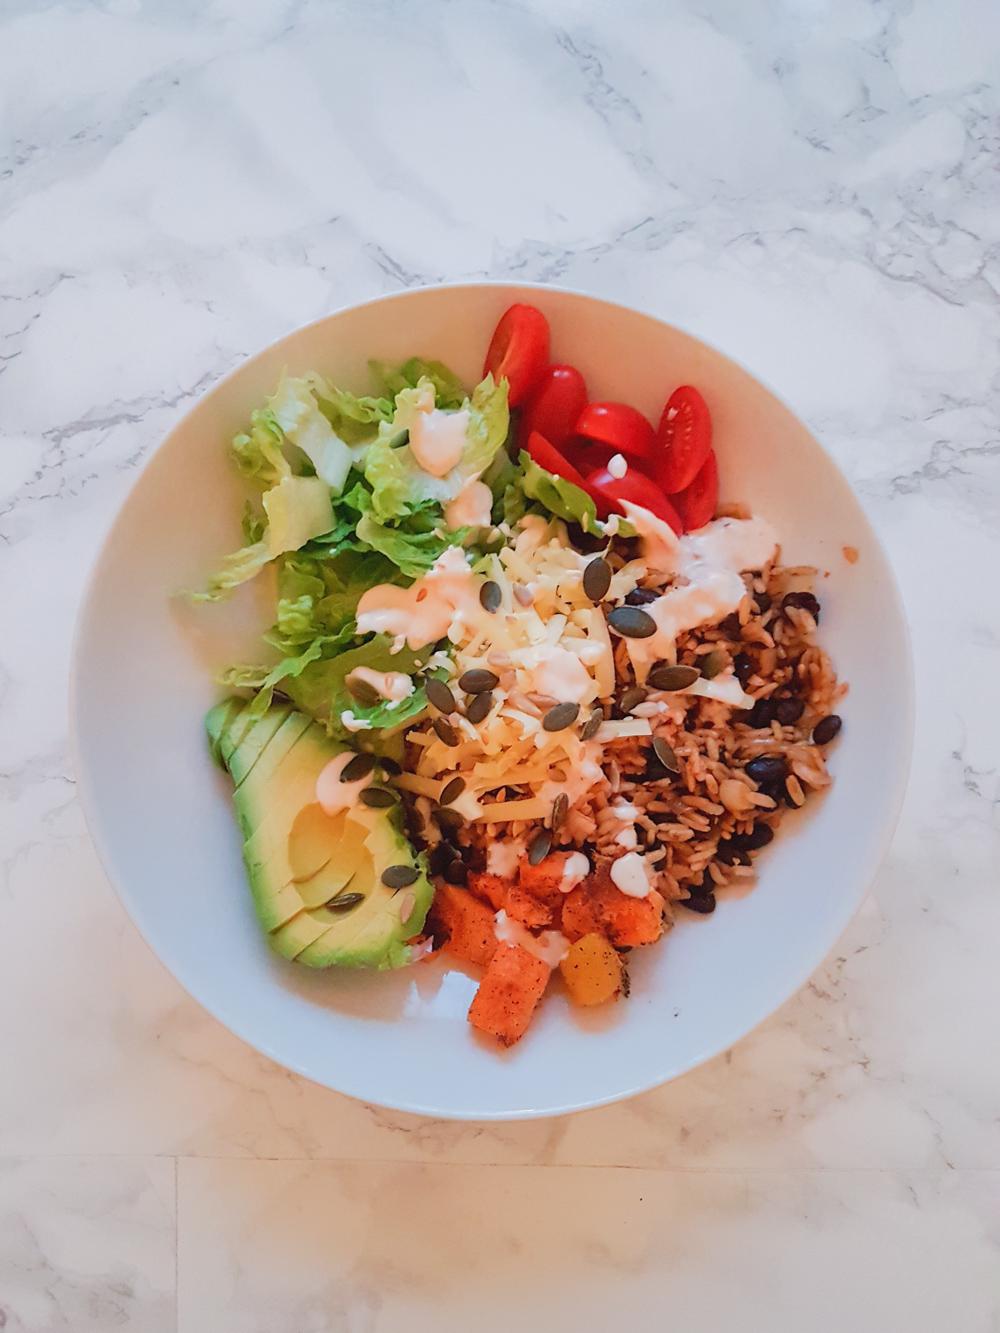 Vegan Burrito Bowl - Avocado, Lettuce, Tomatoes, Wholegrain Rice, Roasted Butternut Squash, Vegan Coconut Yogurt and Vegan Cheese